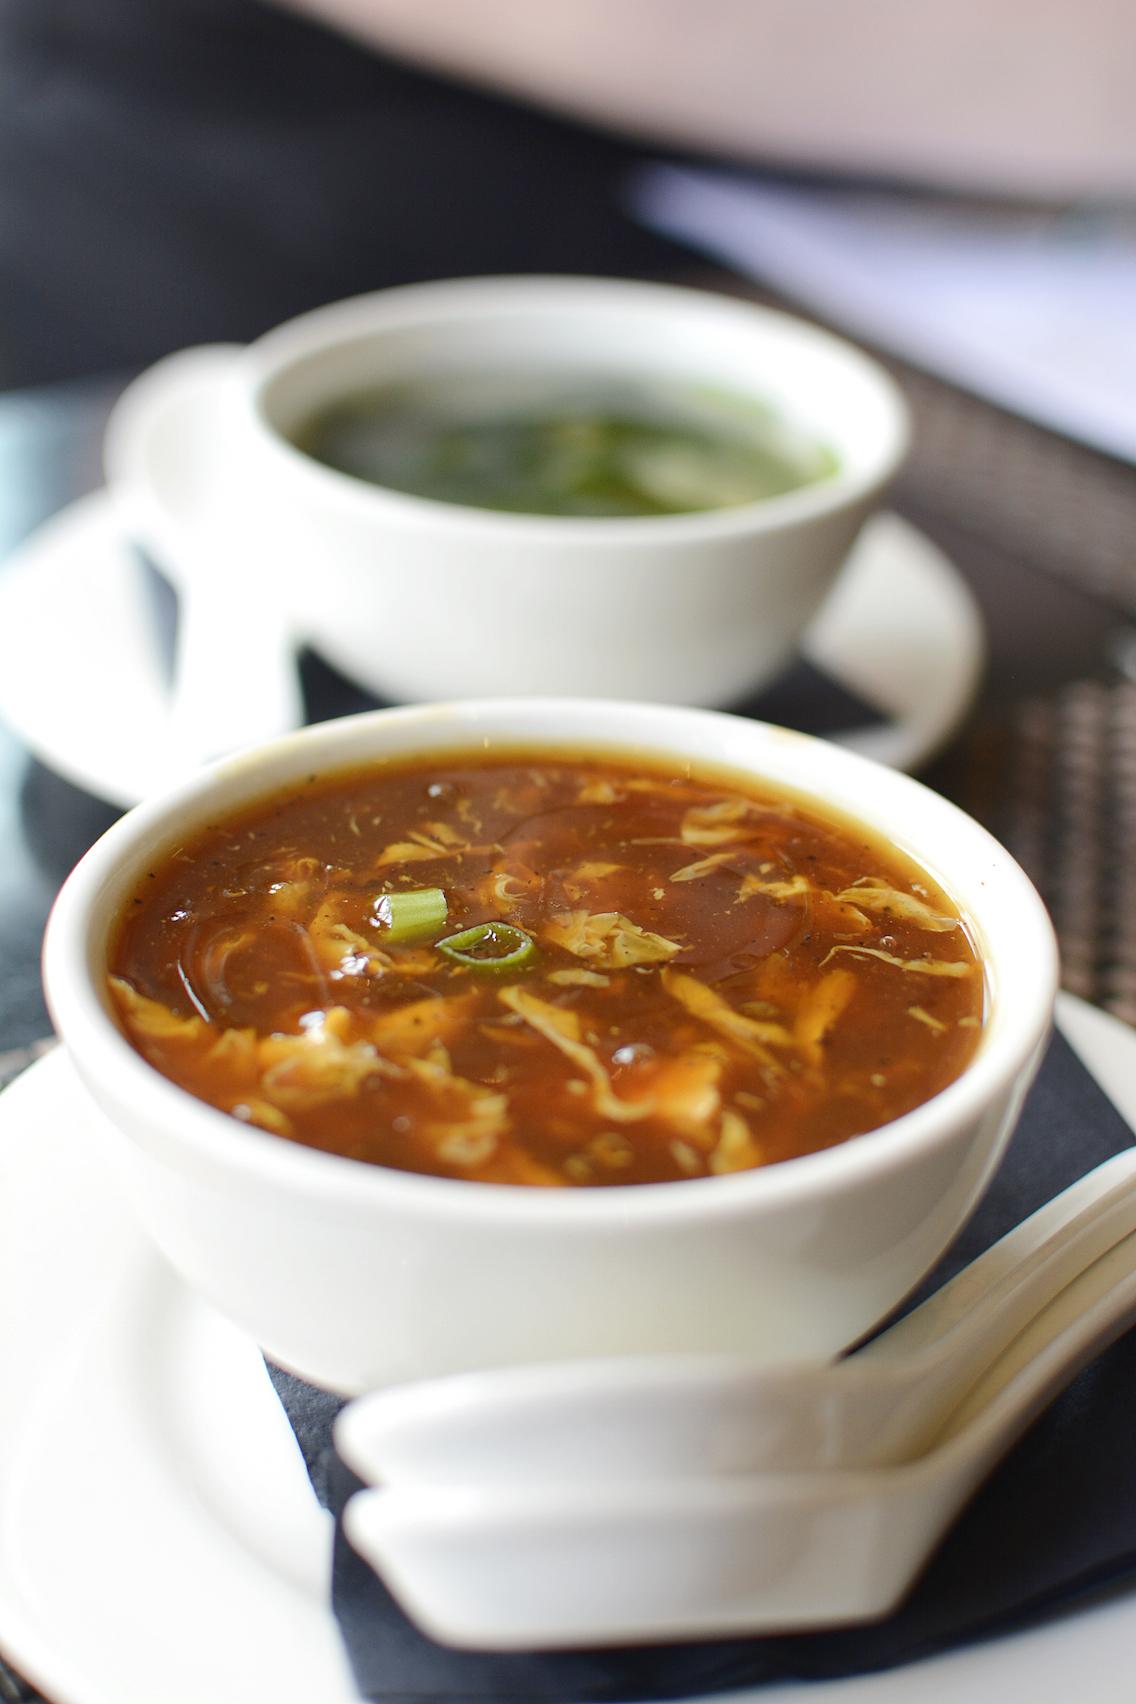 Koi Evanston Hot and Sour Soup